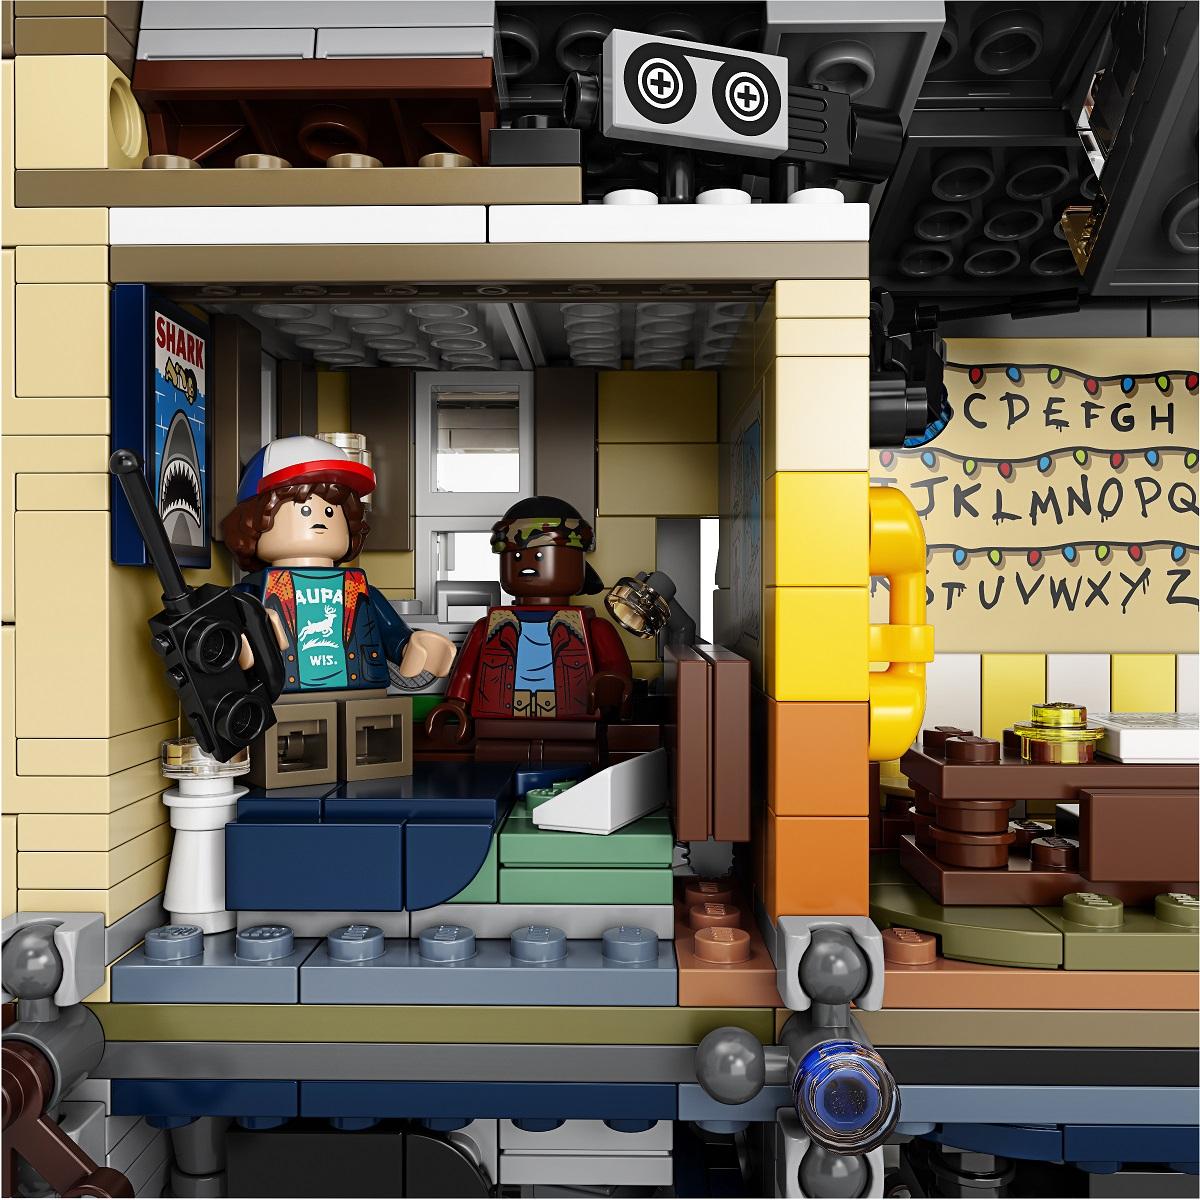 szmk_netflix_stranger_things_lego_upside_down_tothagas_5.jpg